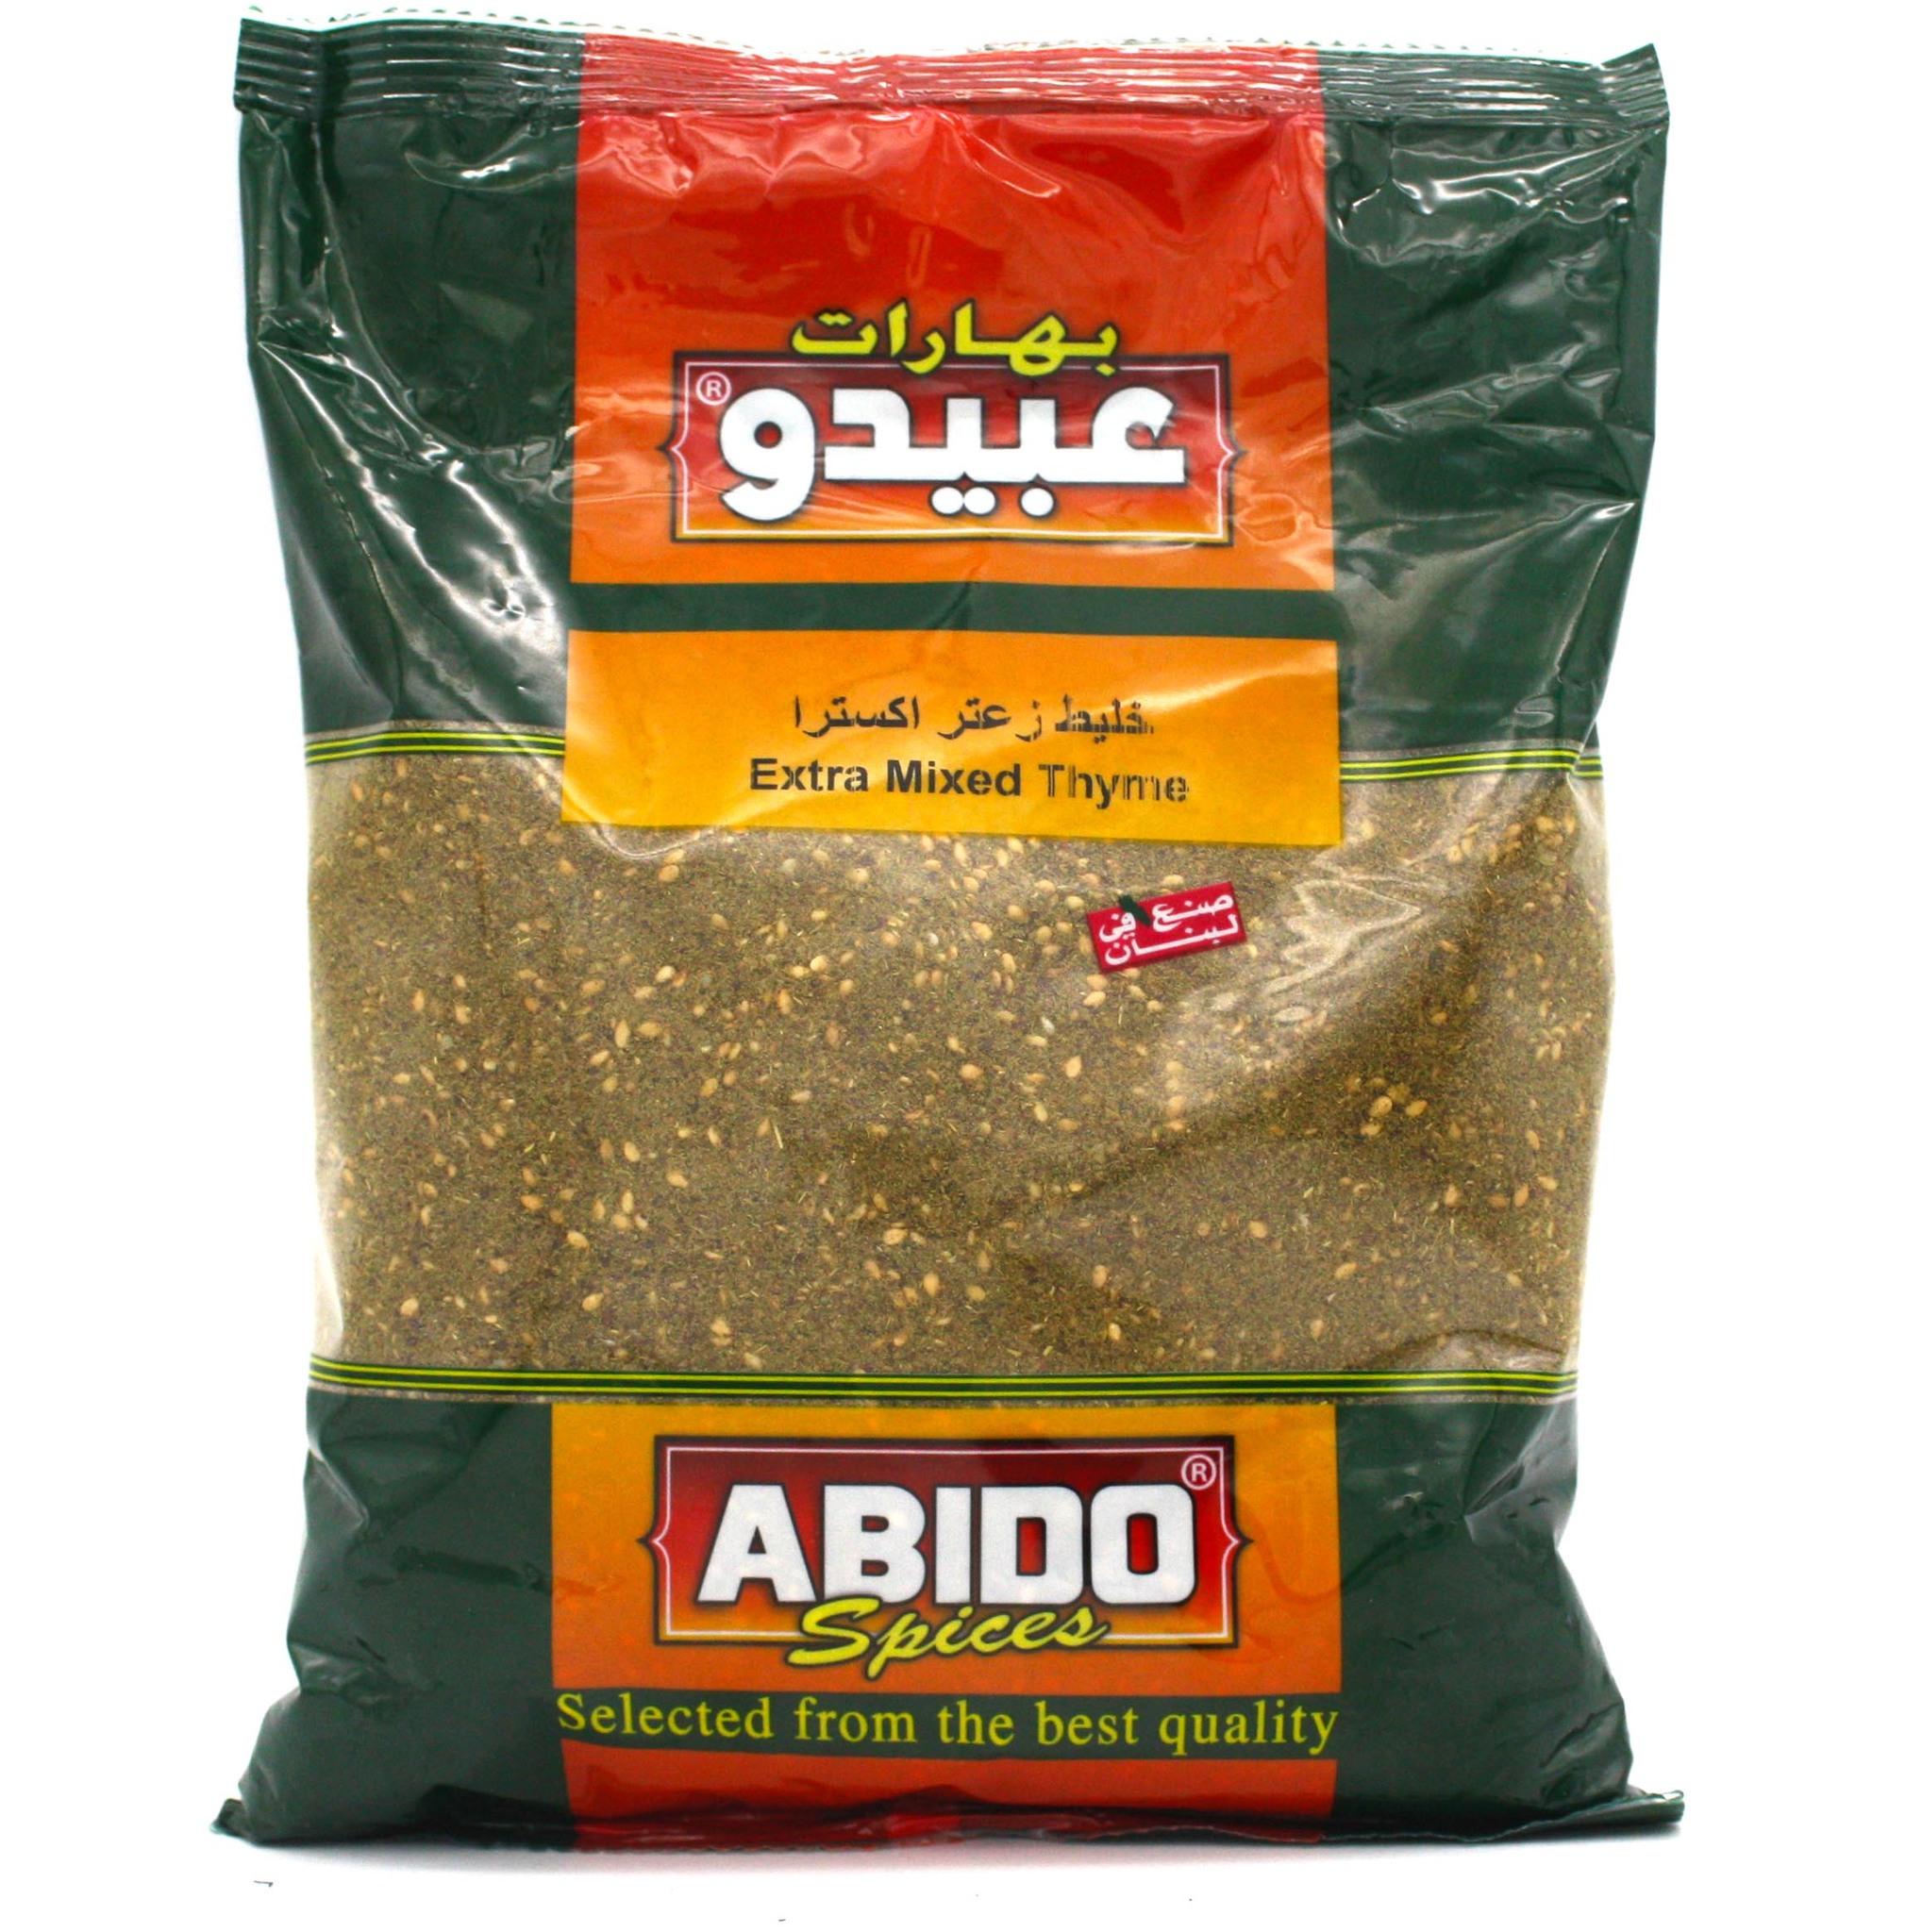 Специи Затар Extra Mixed Thyme, Abido Spices, 500 г (срок годности до 07.2020) import_files_e9_e9356ff3385211e9a9a6484d7ecee297_e32b214e399511e9a9a6484d7ecee297.jpg